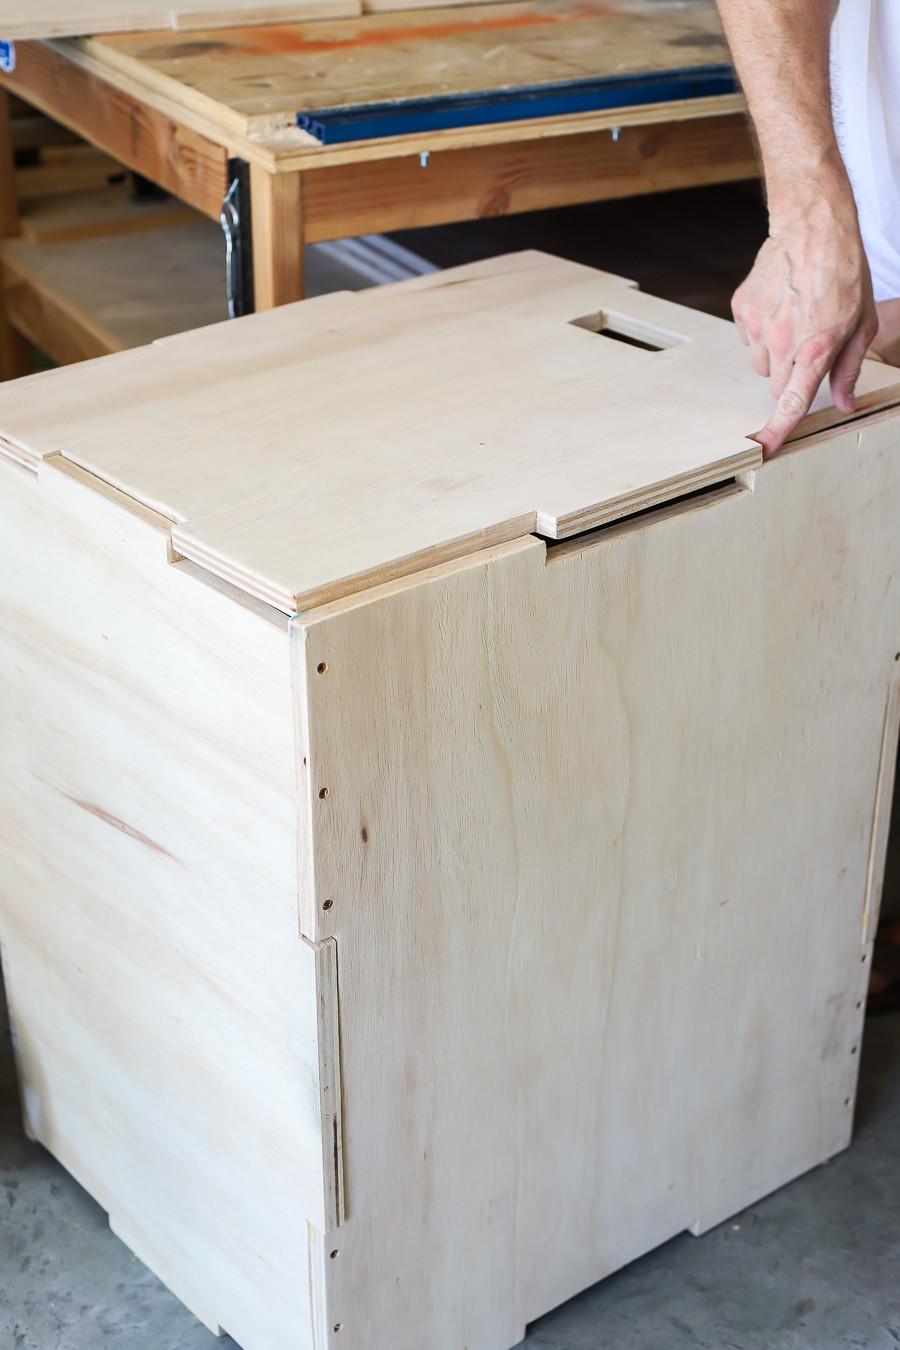 DIY Plyometric Box  Build a DIY 3 in 1 Plyometric Box for Box Jump Exercises